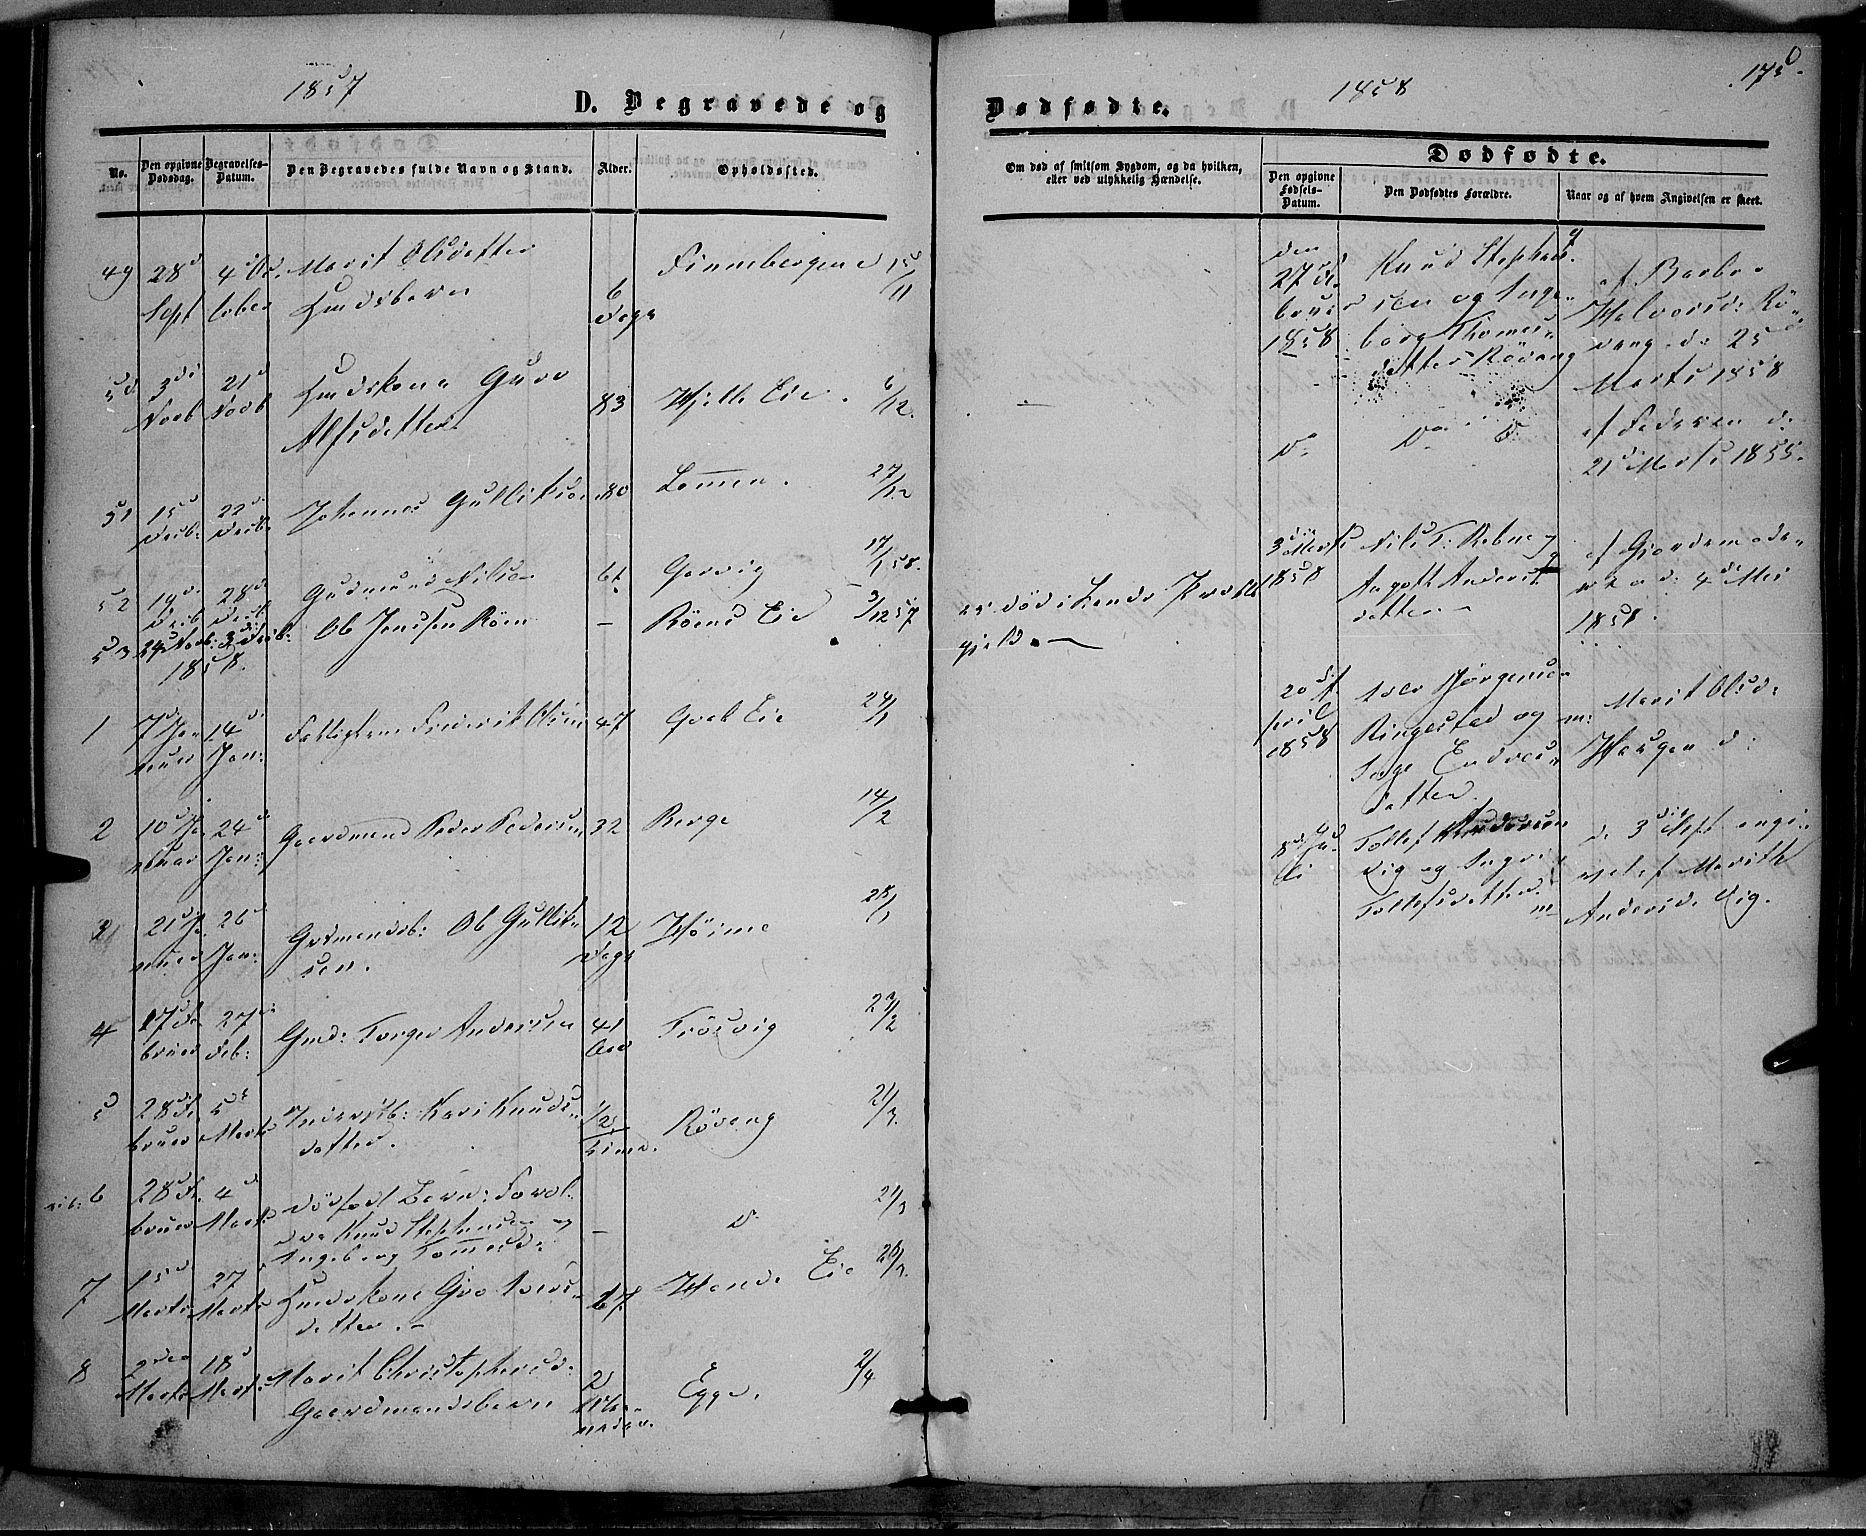 SAH, Vestre Slidre prestekontor, Ministerialbok nr. 2, 1856-1864, s. 175